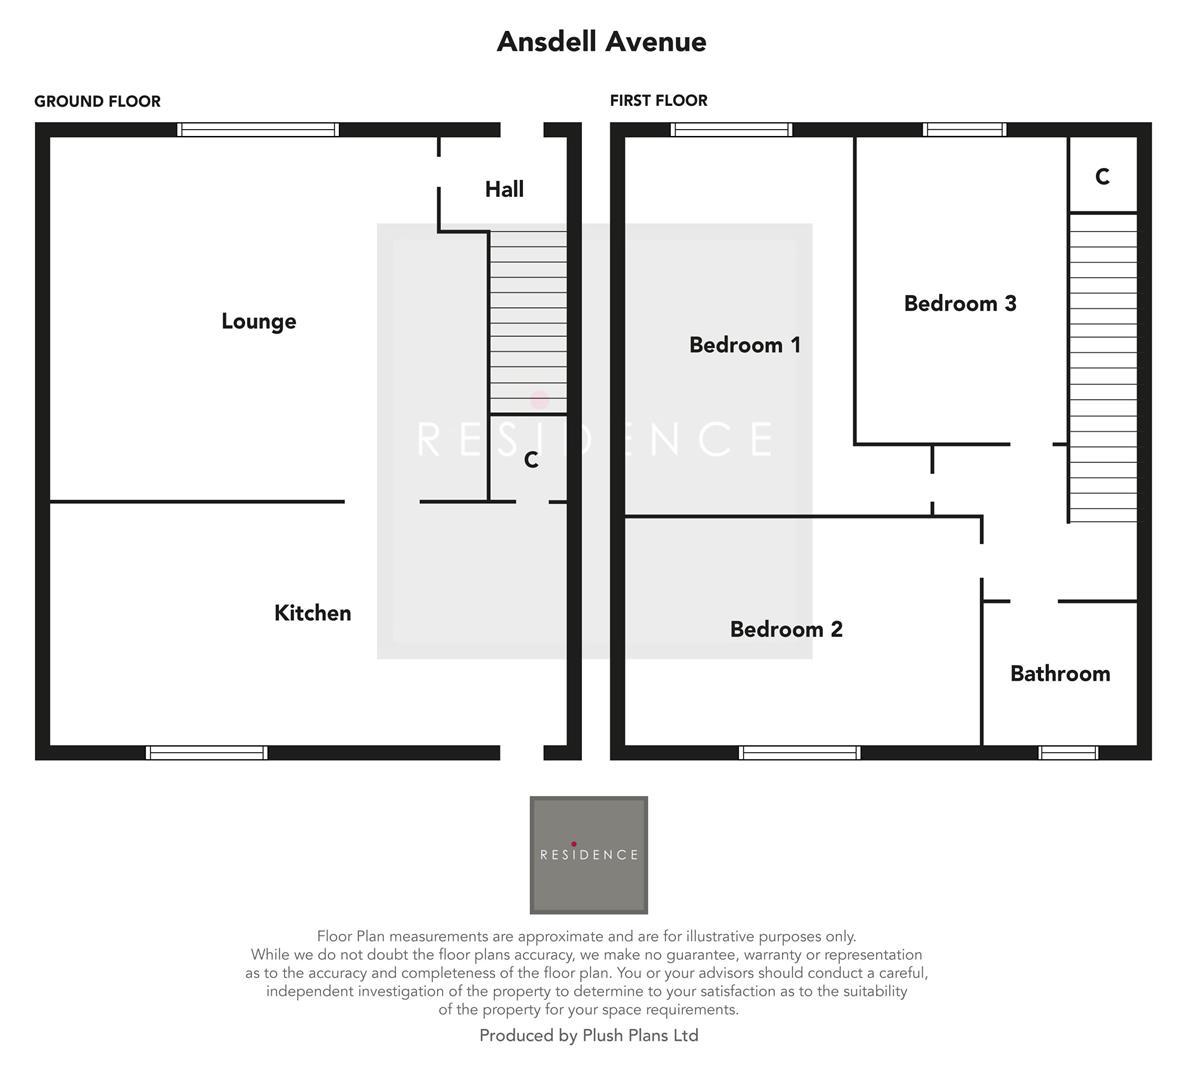 Ansdell Avenue_fp.jpg